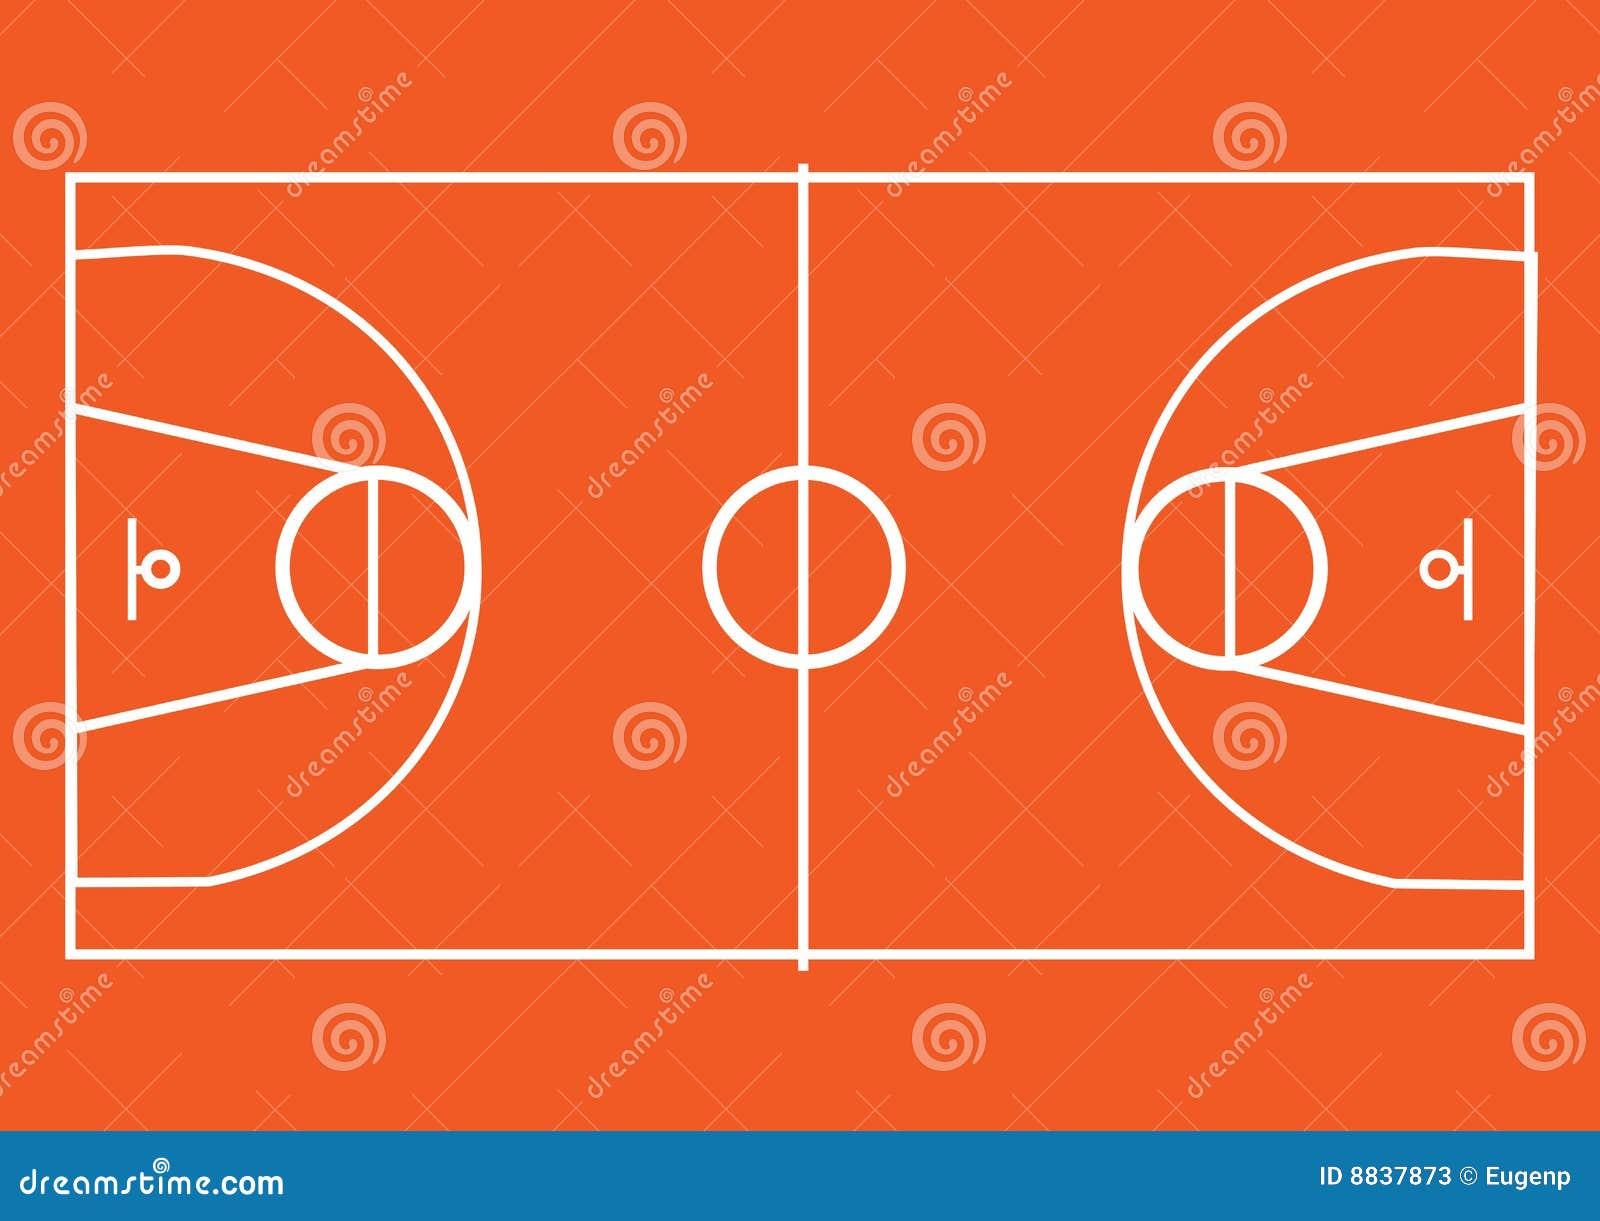 http://thumbs.dreamstime.com/z/basketball-pitch-8837873.jpg